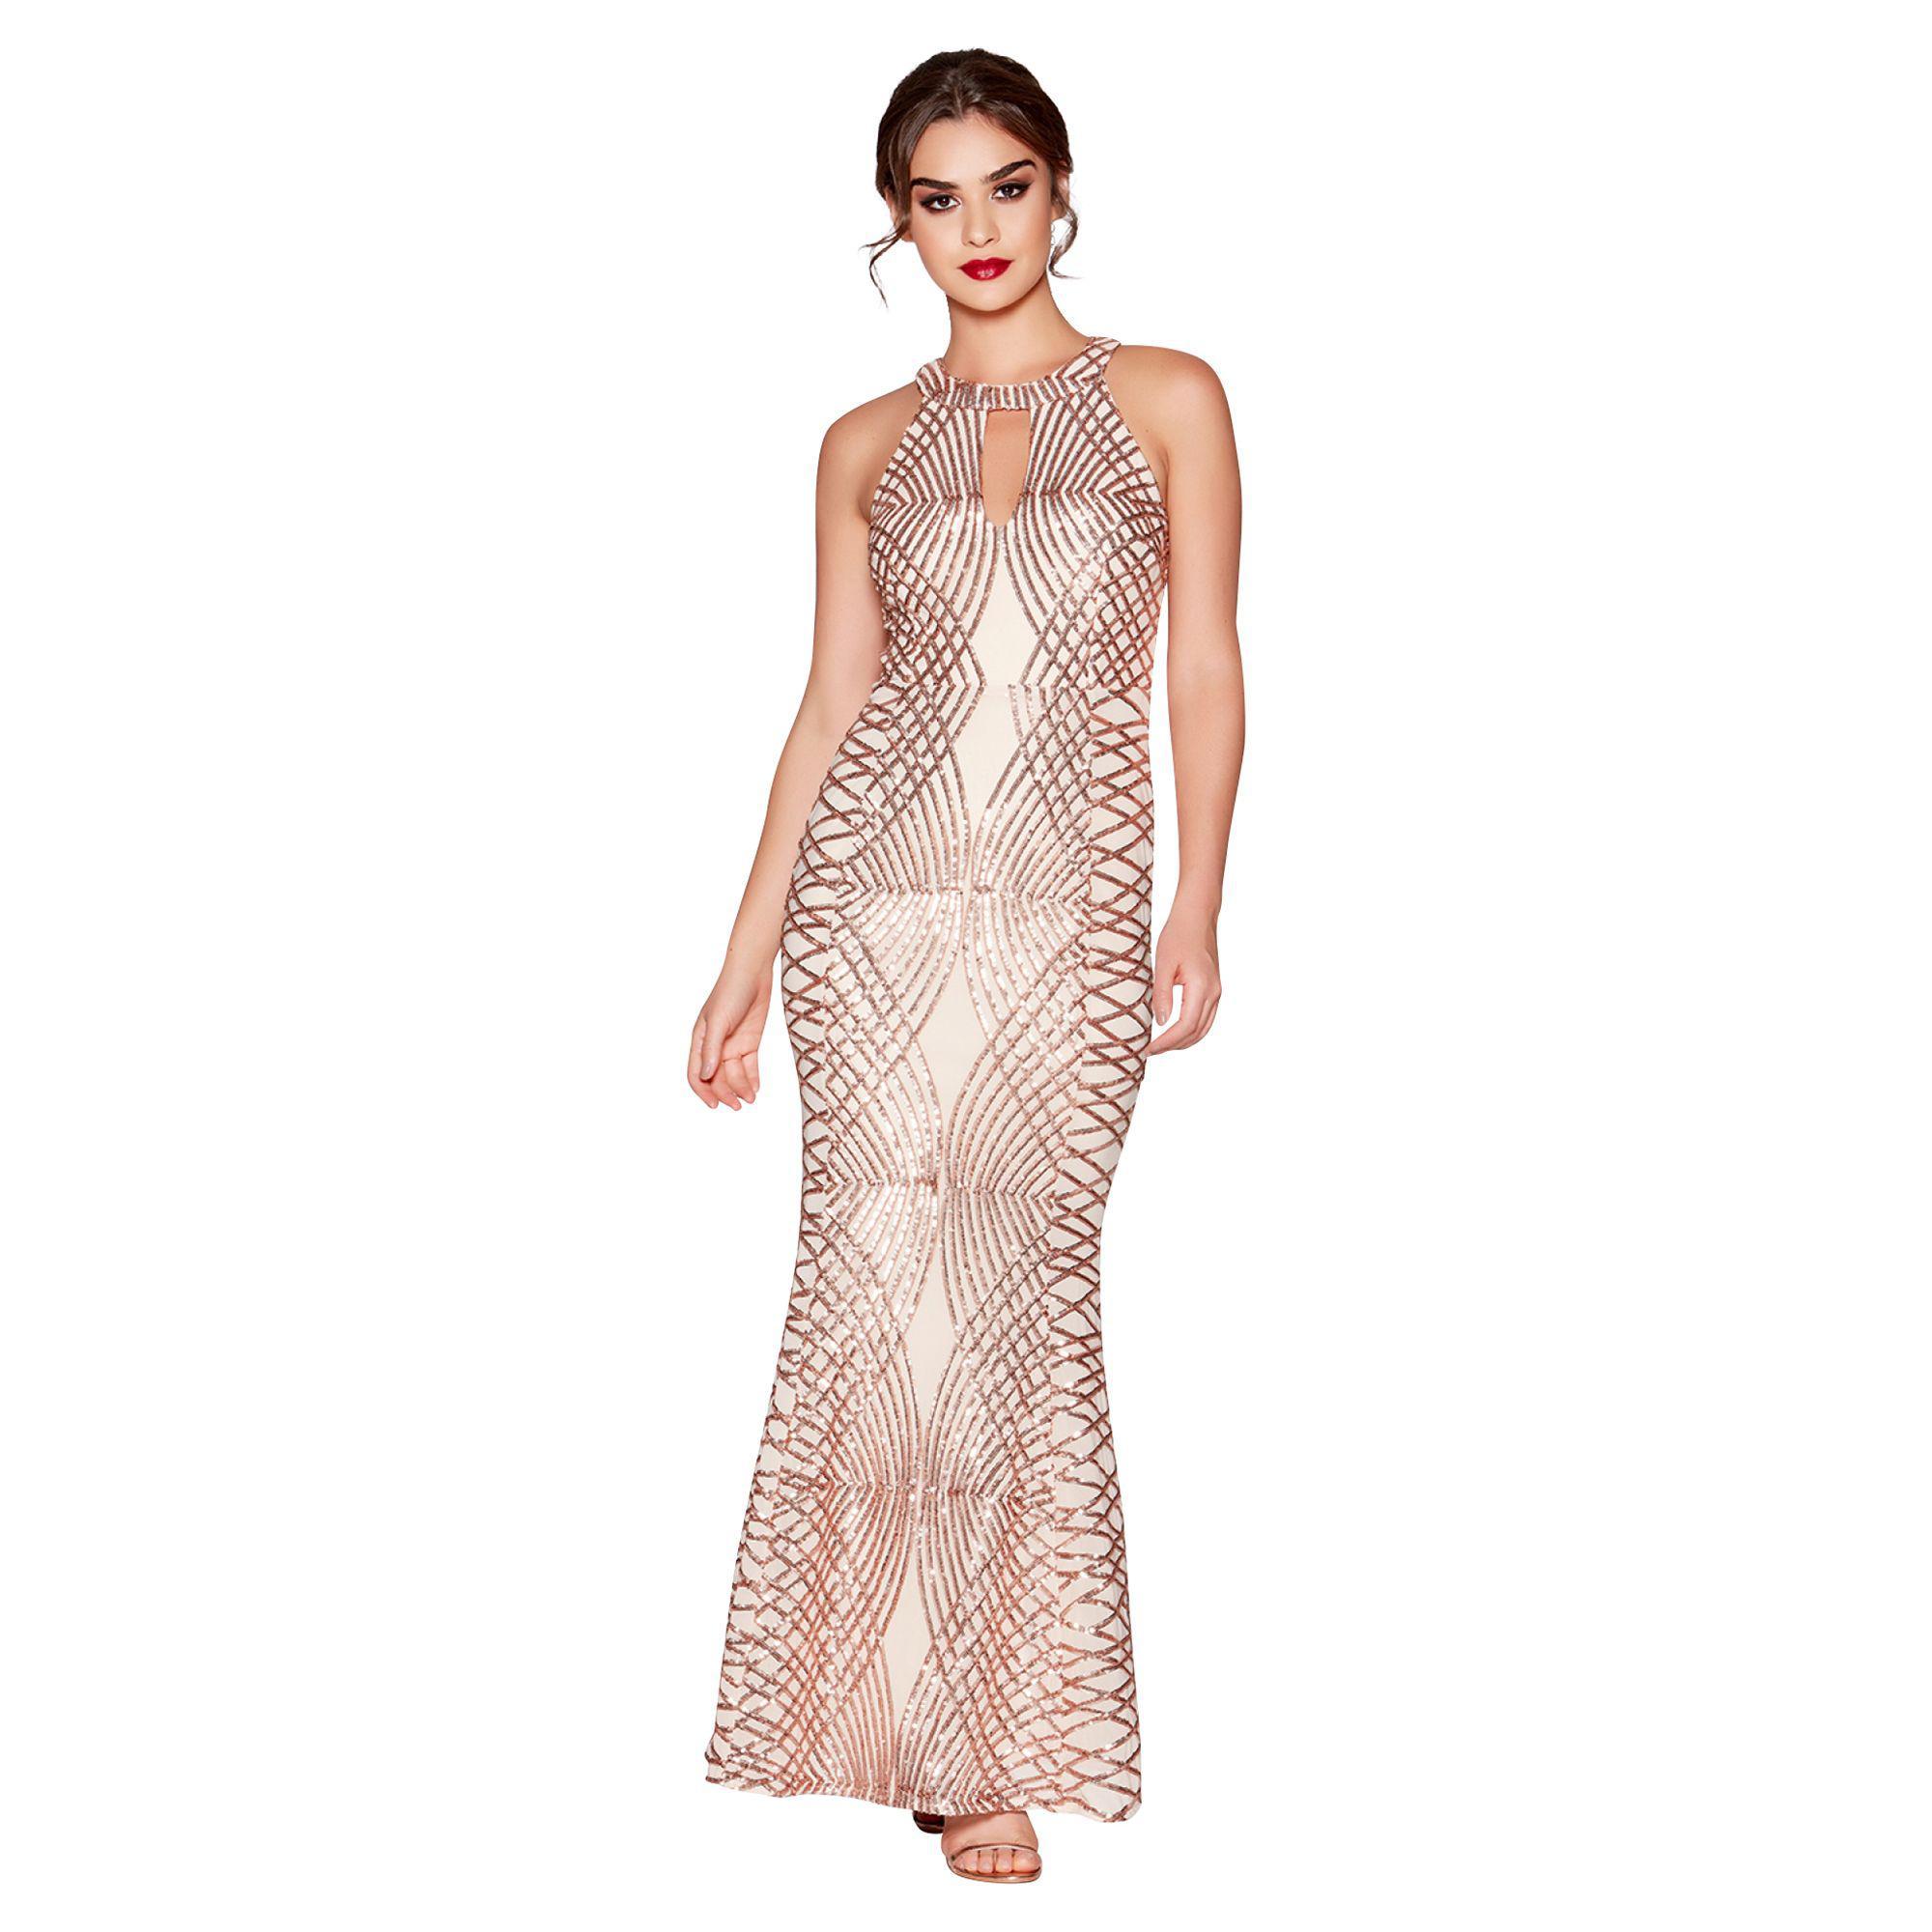 c778c450 Tap to visit site. Quiz - Metallic Rose Gold Sequin And Mesh Fishtail Maxi  Dress - Lyst